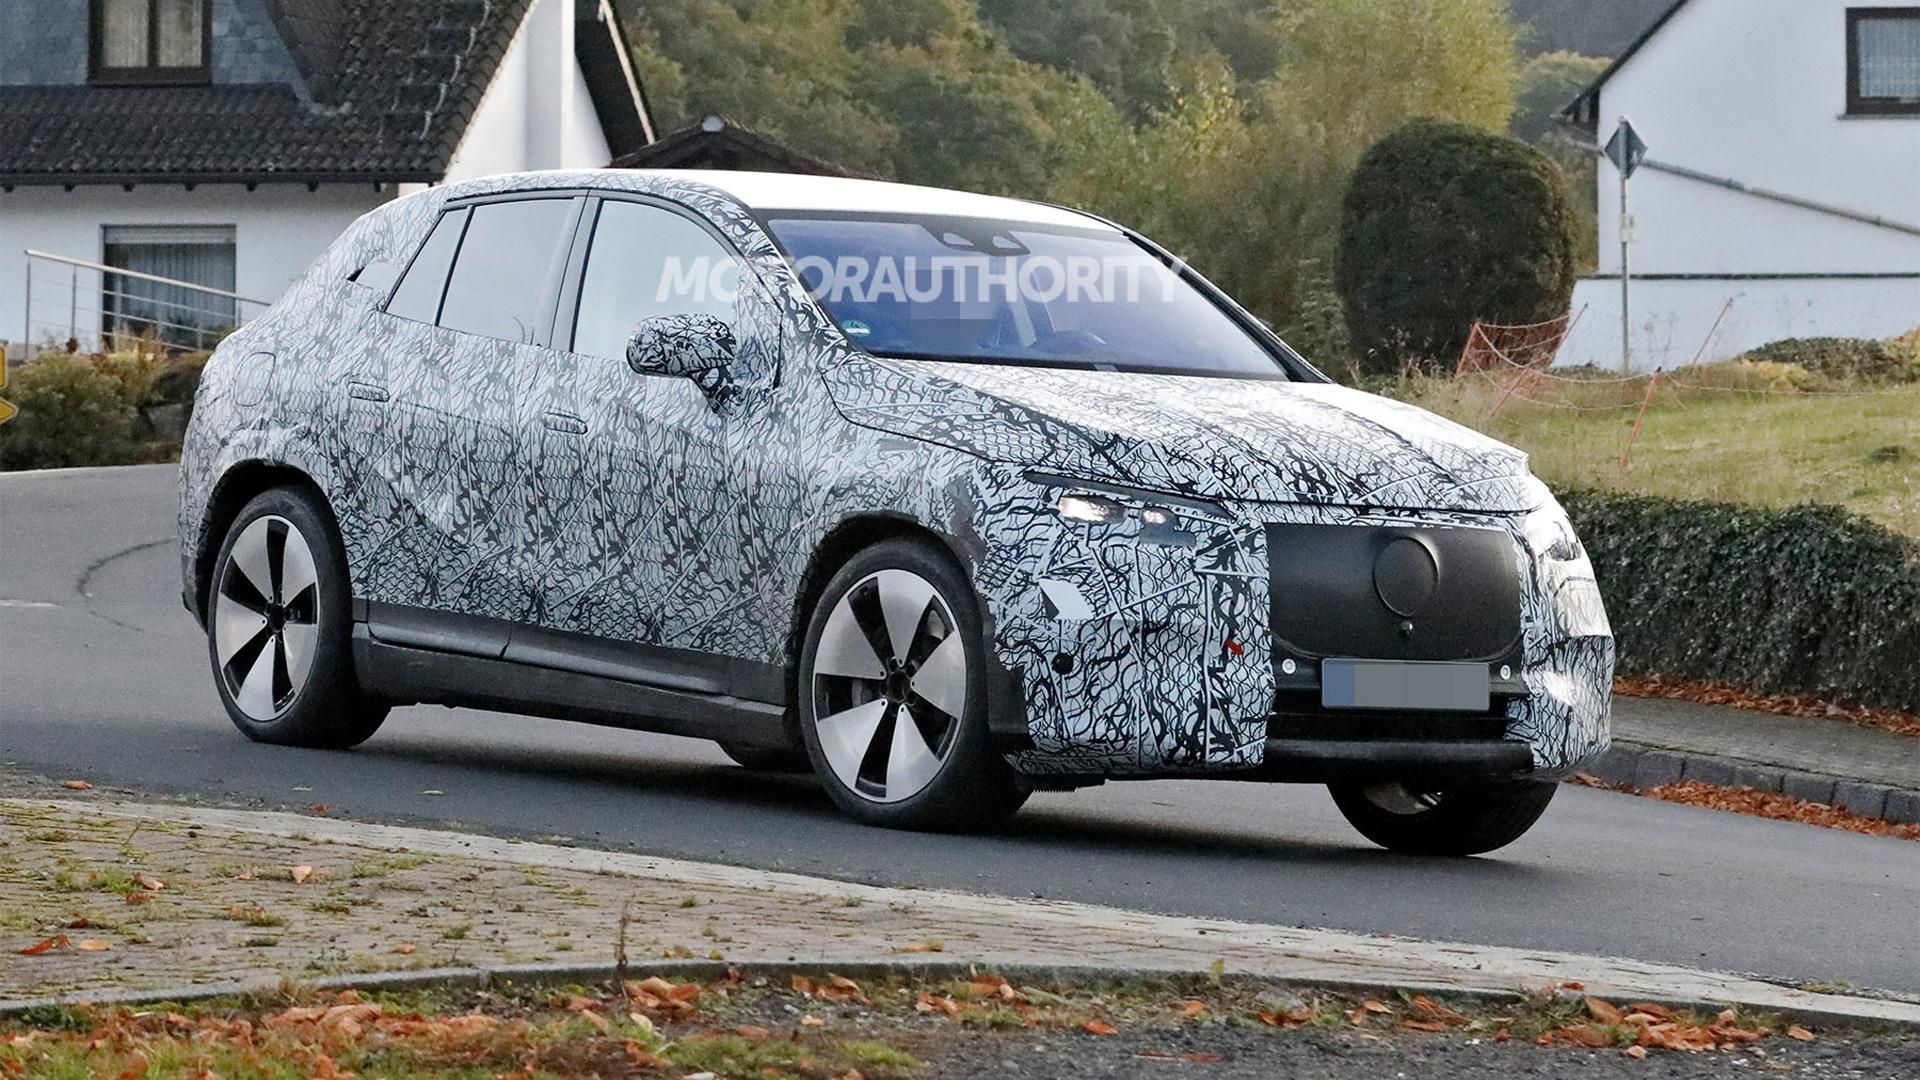 2023 Mercedes-Benz EQE SUV spy shots - Photo credit:S. Baldauf/SB-Medien